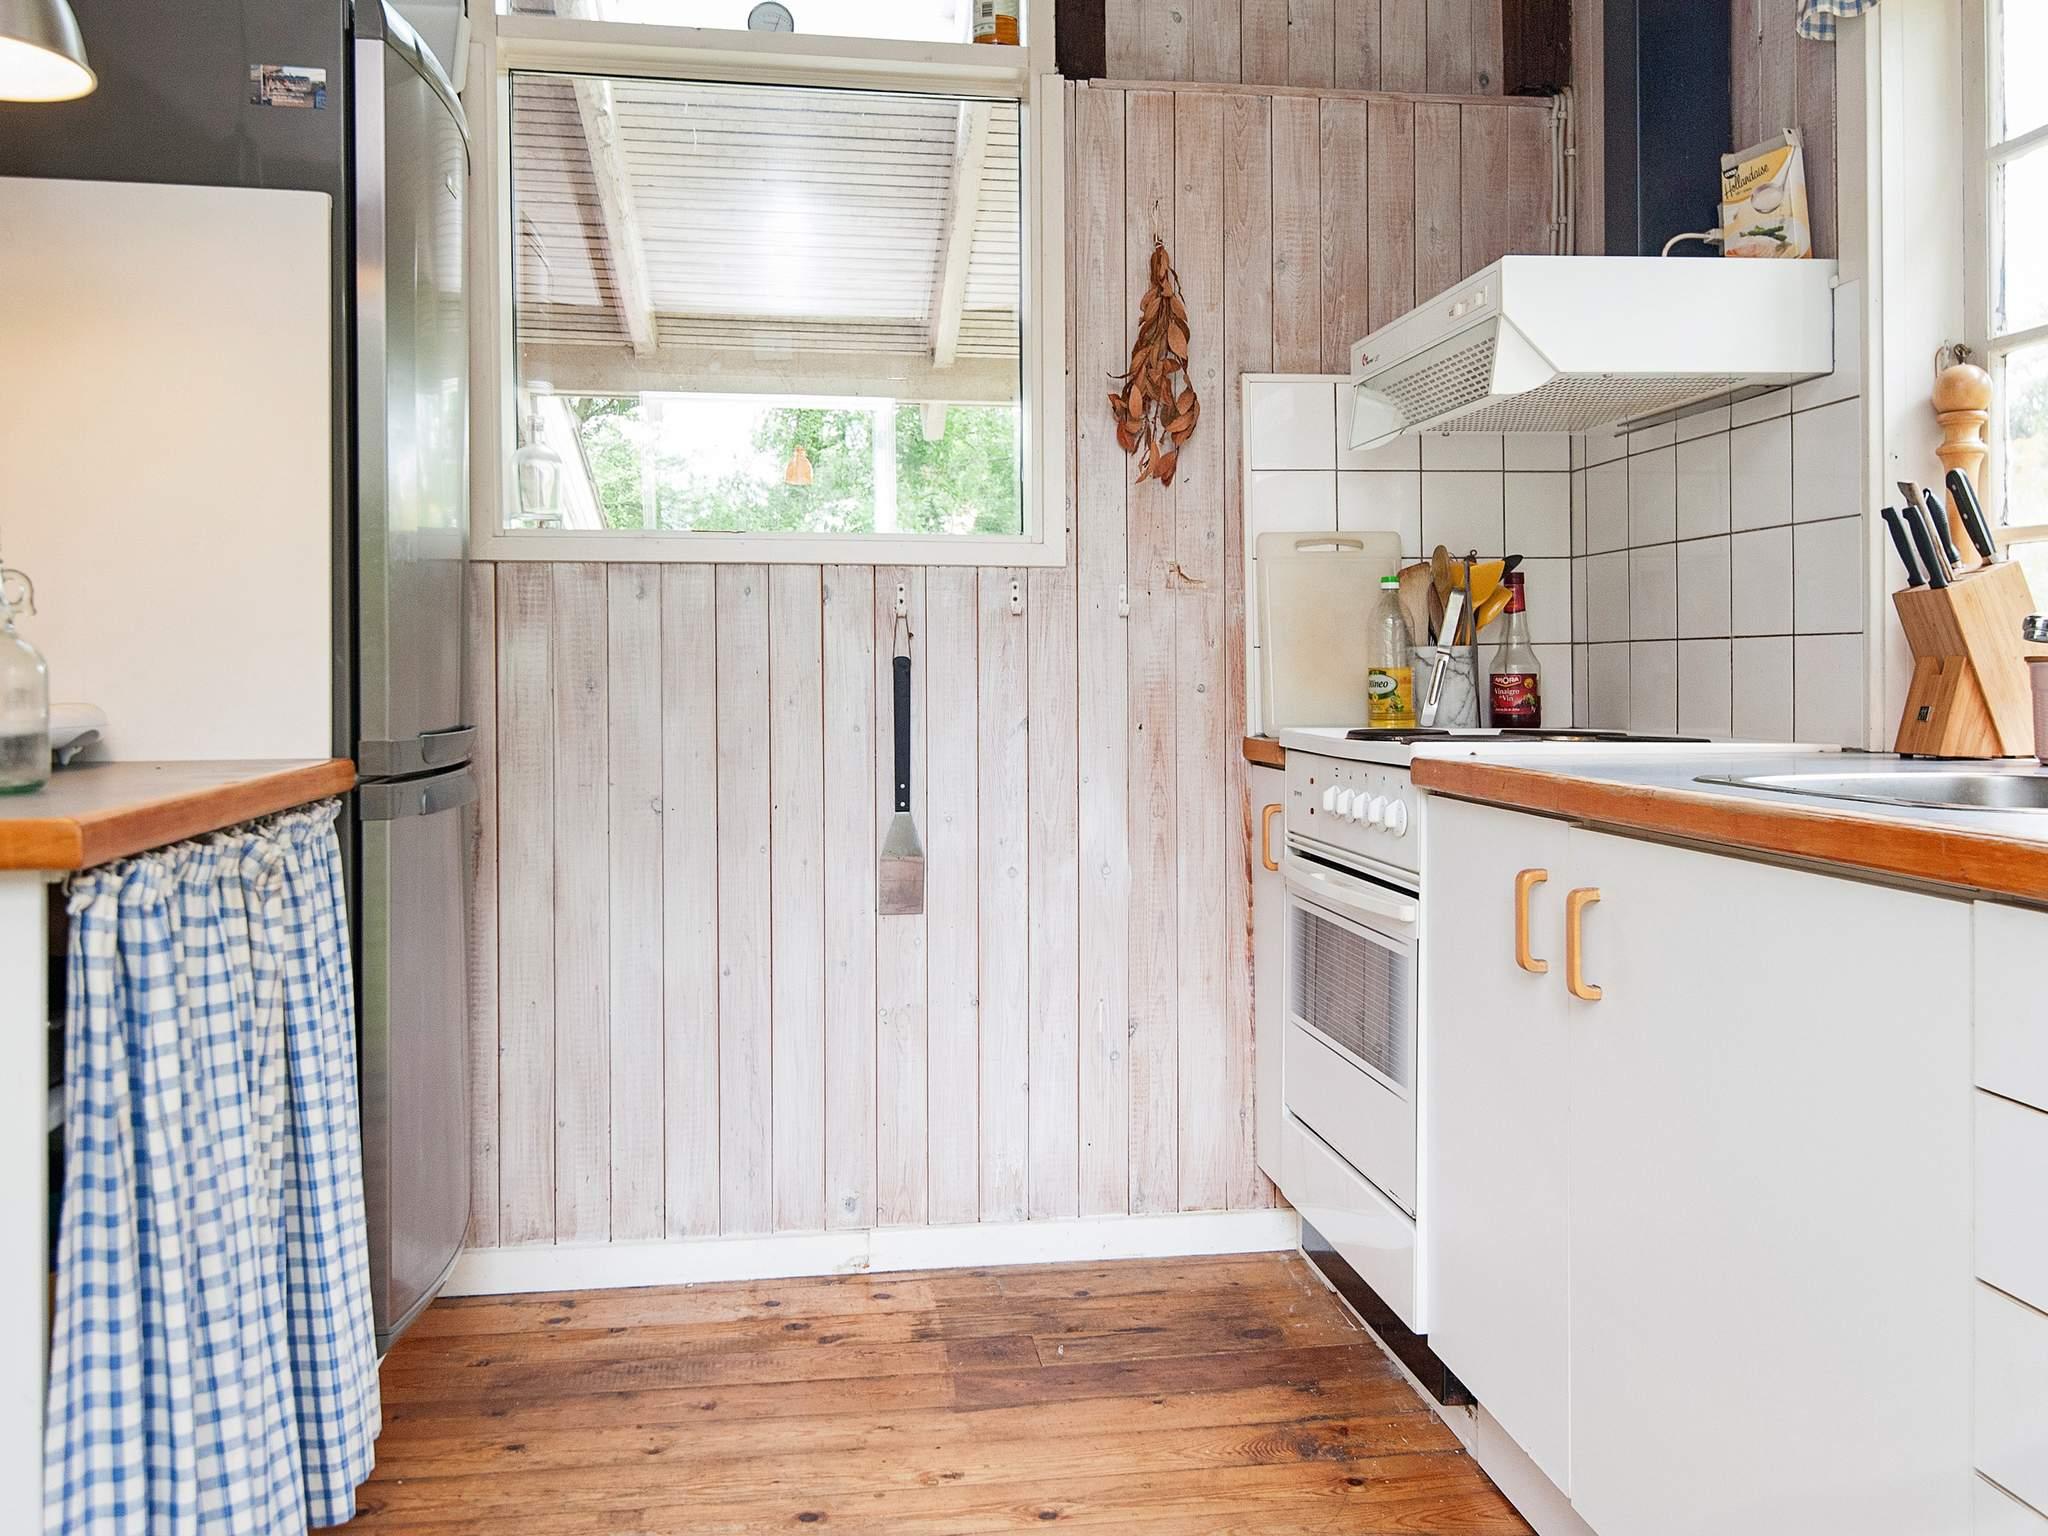 Maison de vacances Helgenæs (2354348), Knebel, , Mer Baltique danoise, Danemark, image 7